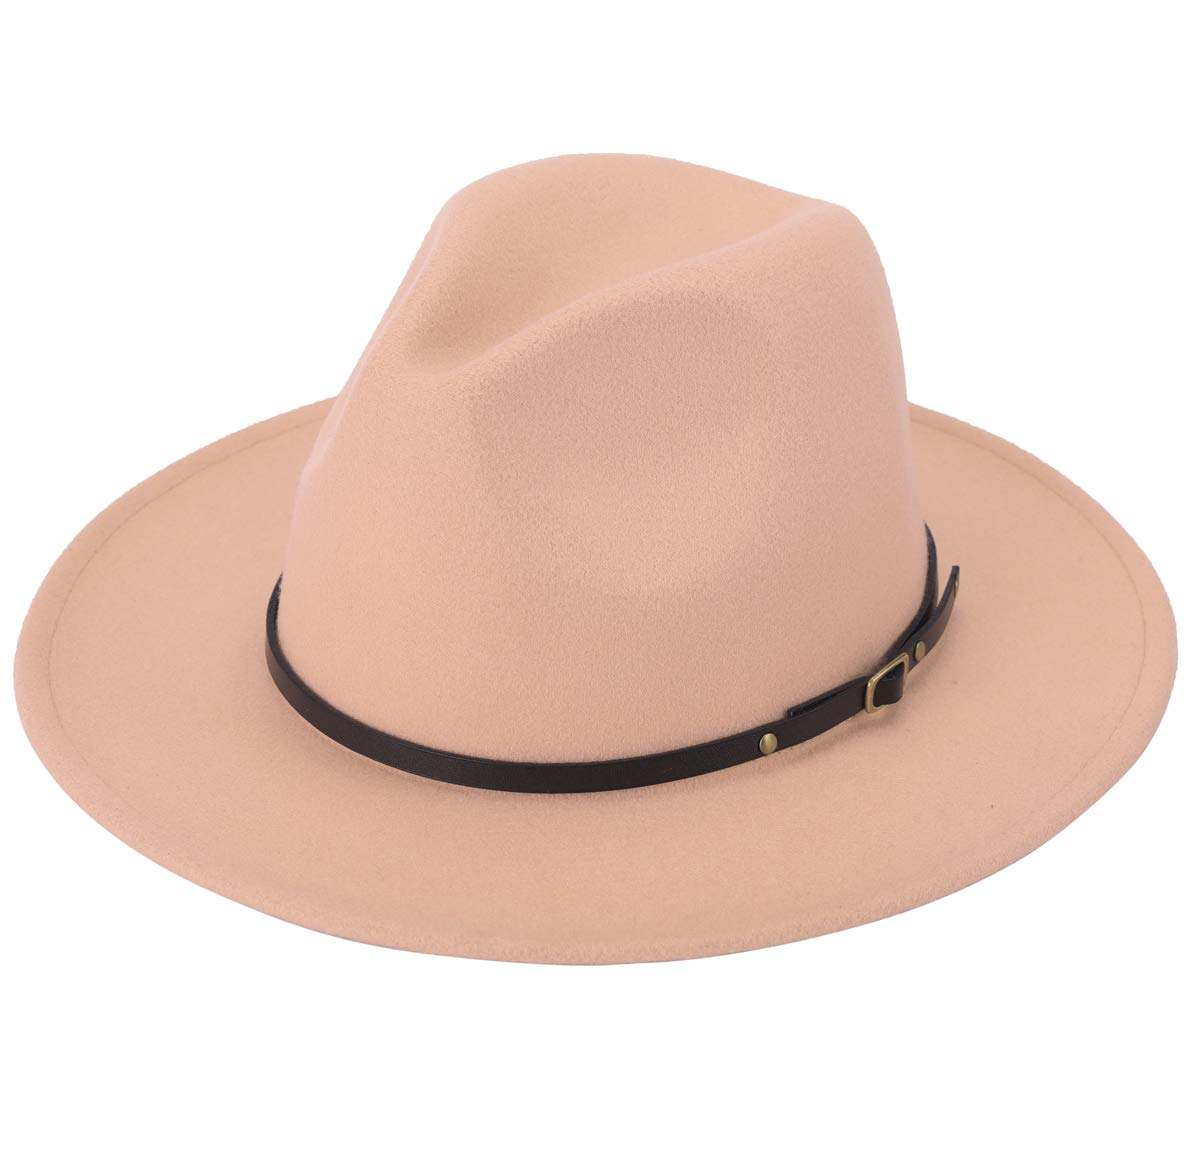 Lanzom Women Lady Retro Wide Brim Floppy Panama Hat Belt Buckle Wool Fedora Hat (Camel, One Size) by Lanzom